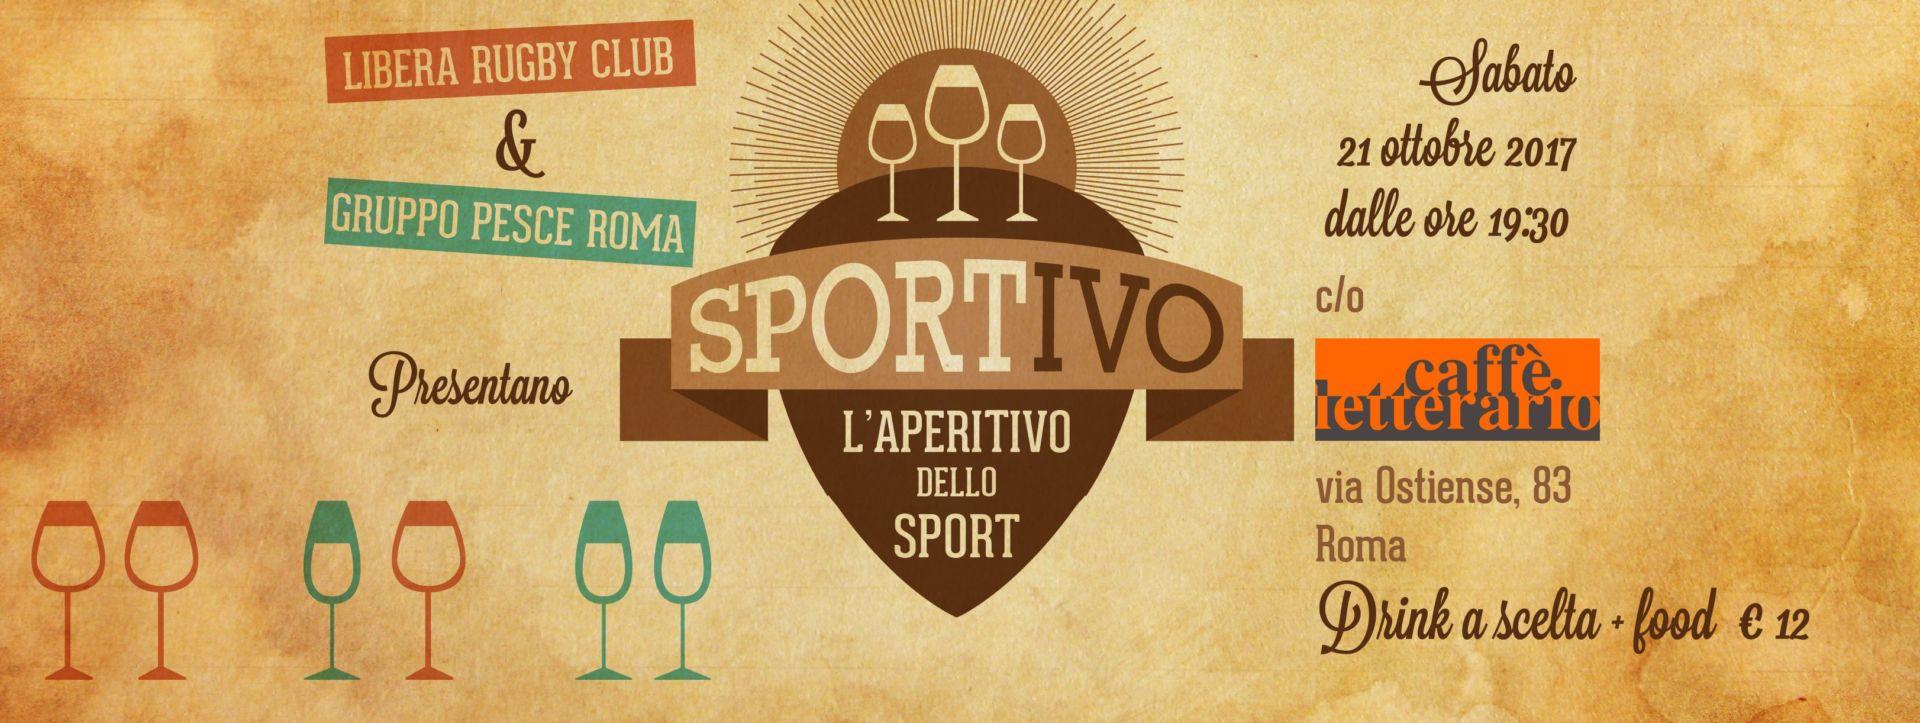 17_10_21_sportivo